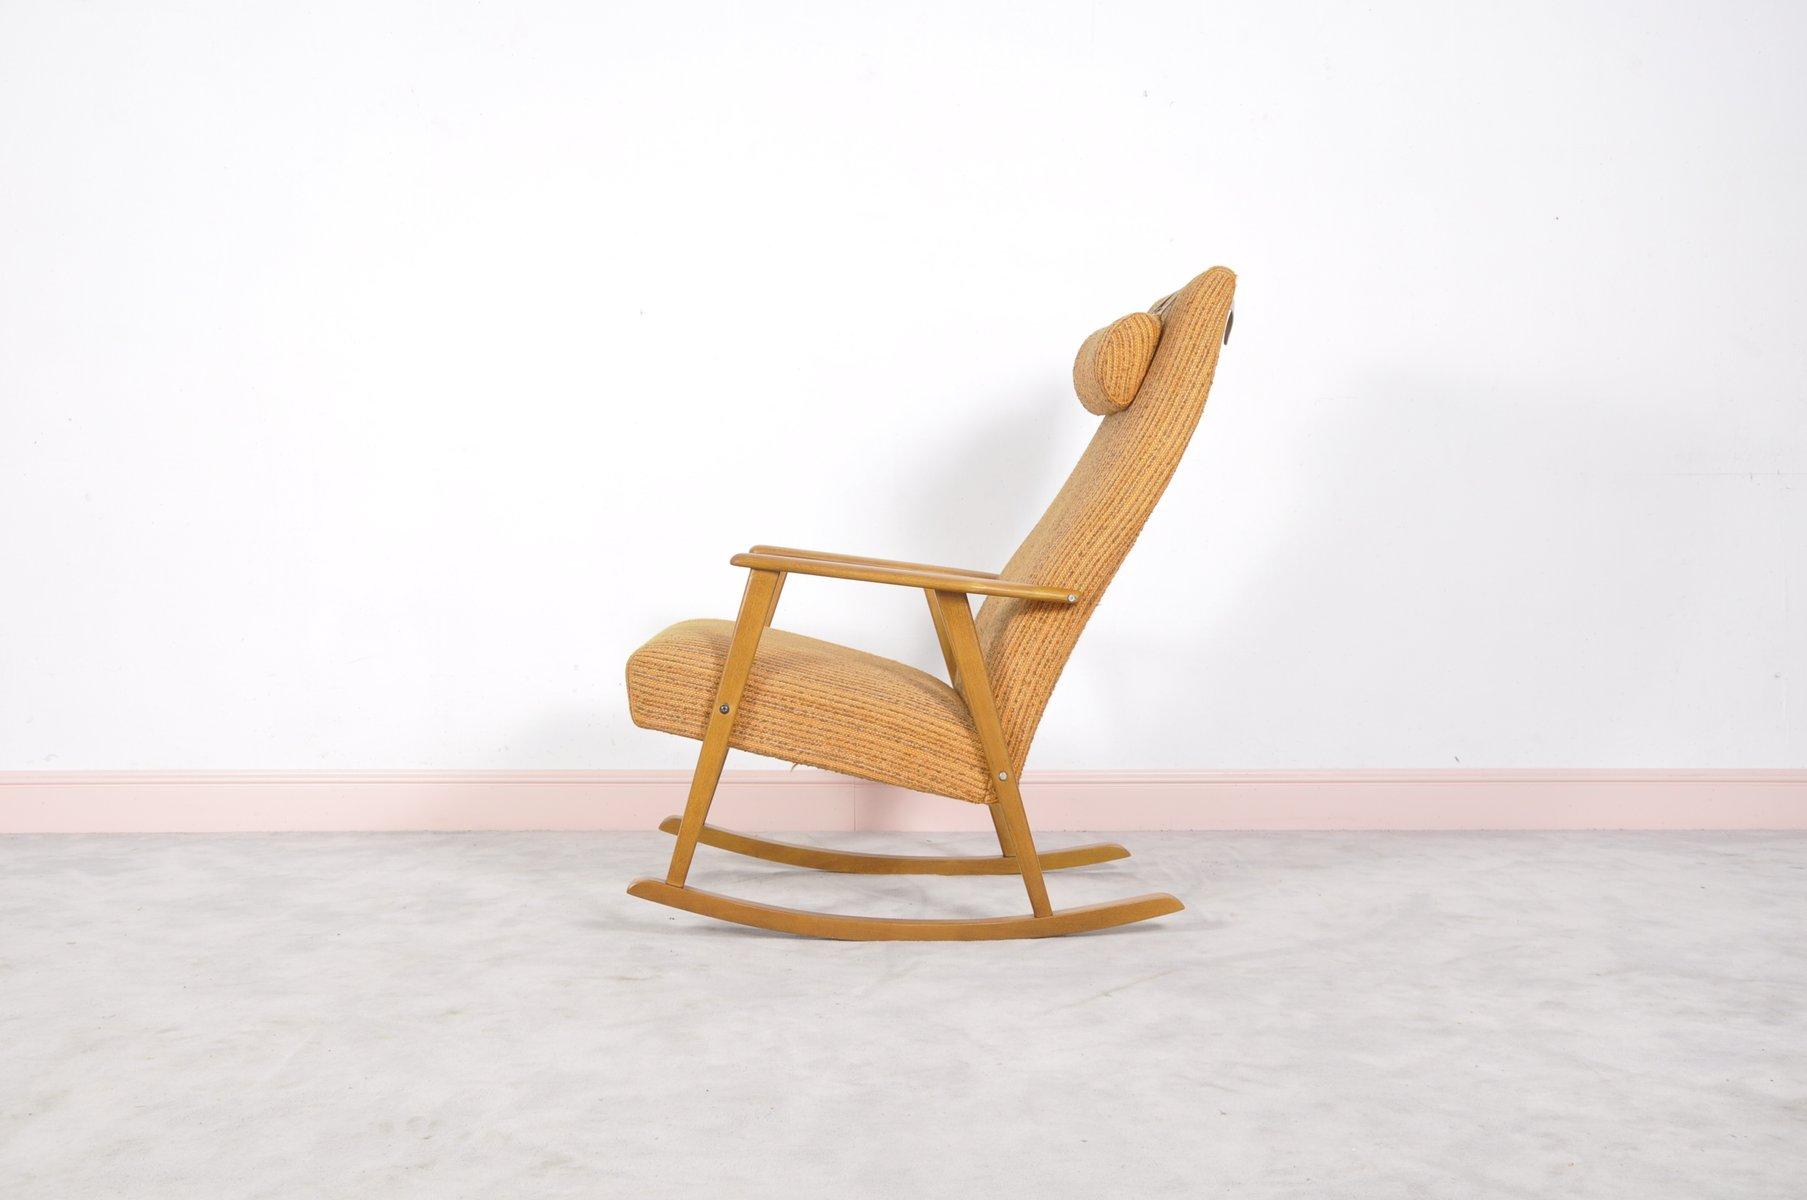 Schaukelstuhl Modern schwedischer mid century modern schaukelstuhl johanson design